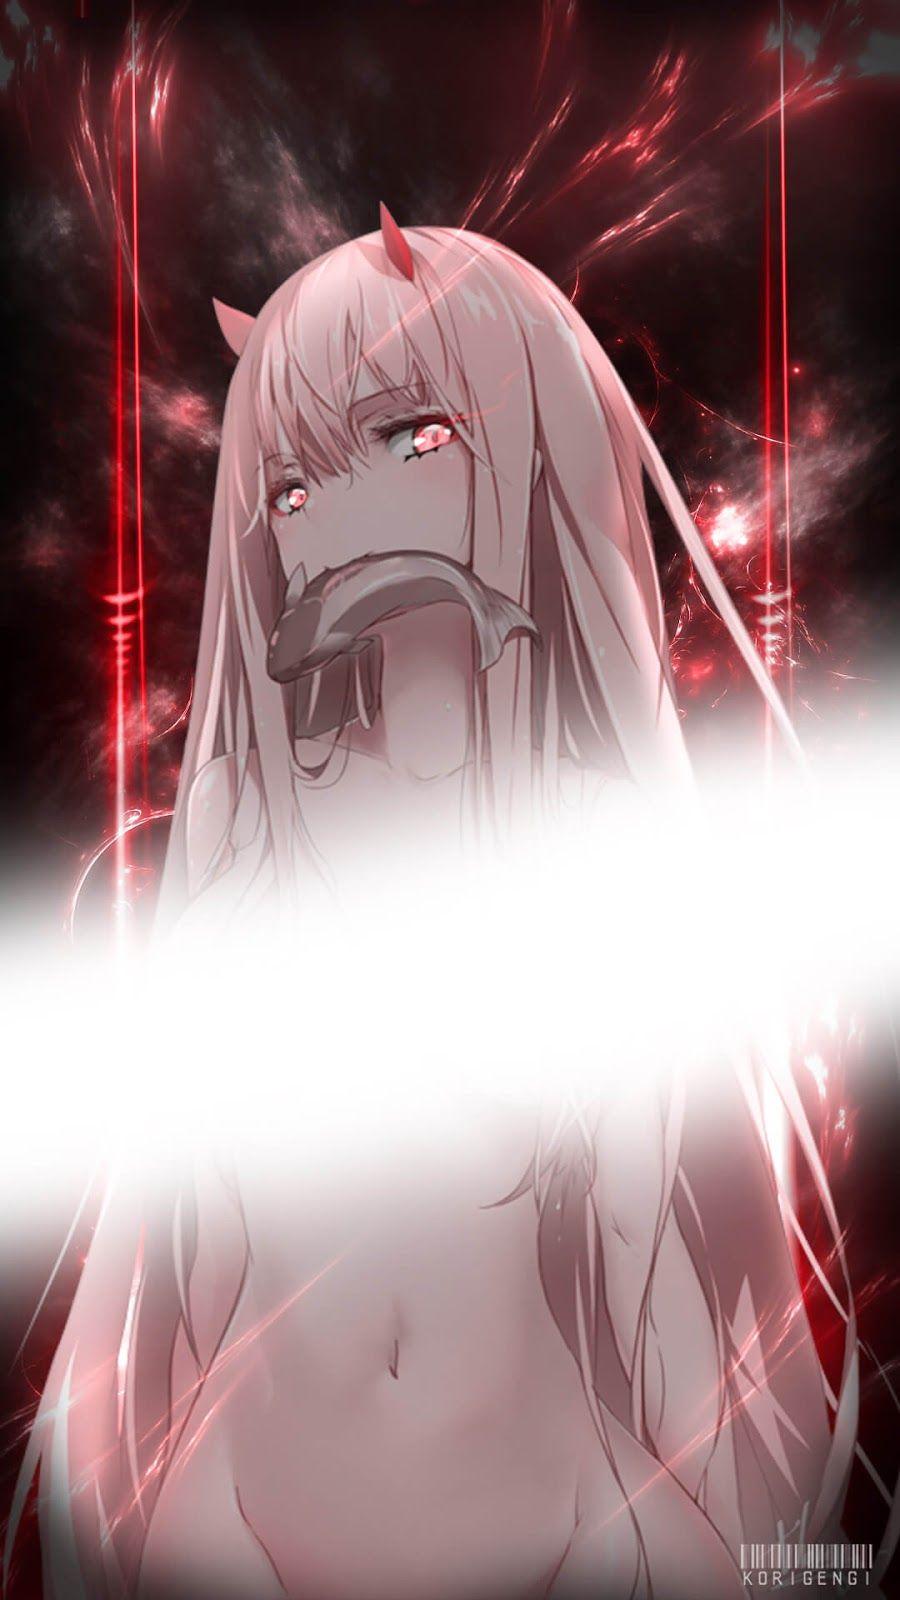 Zero Two Korigengi Wallpaper Anime